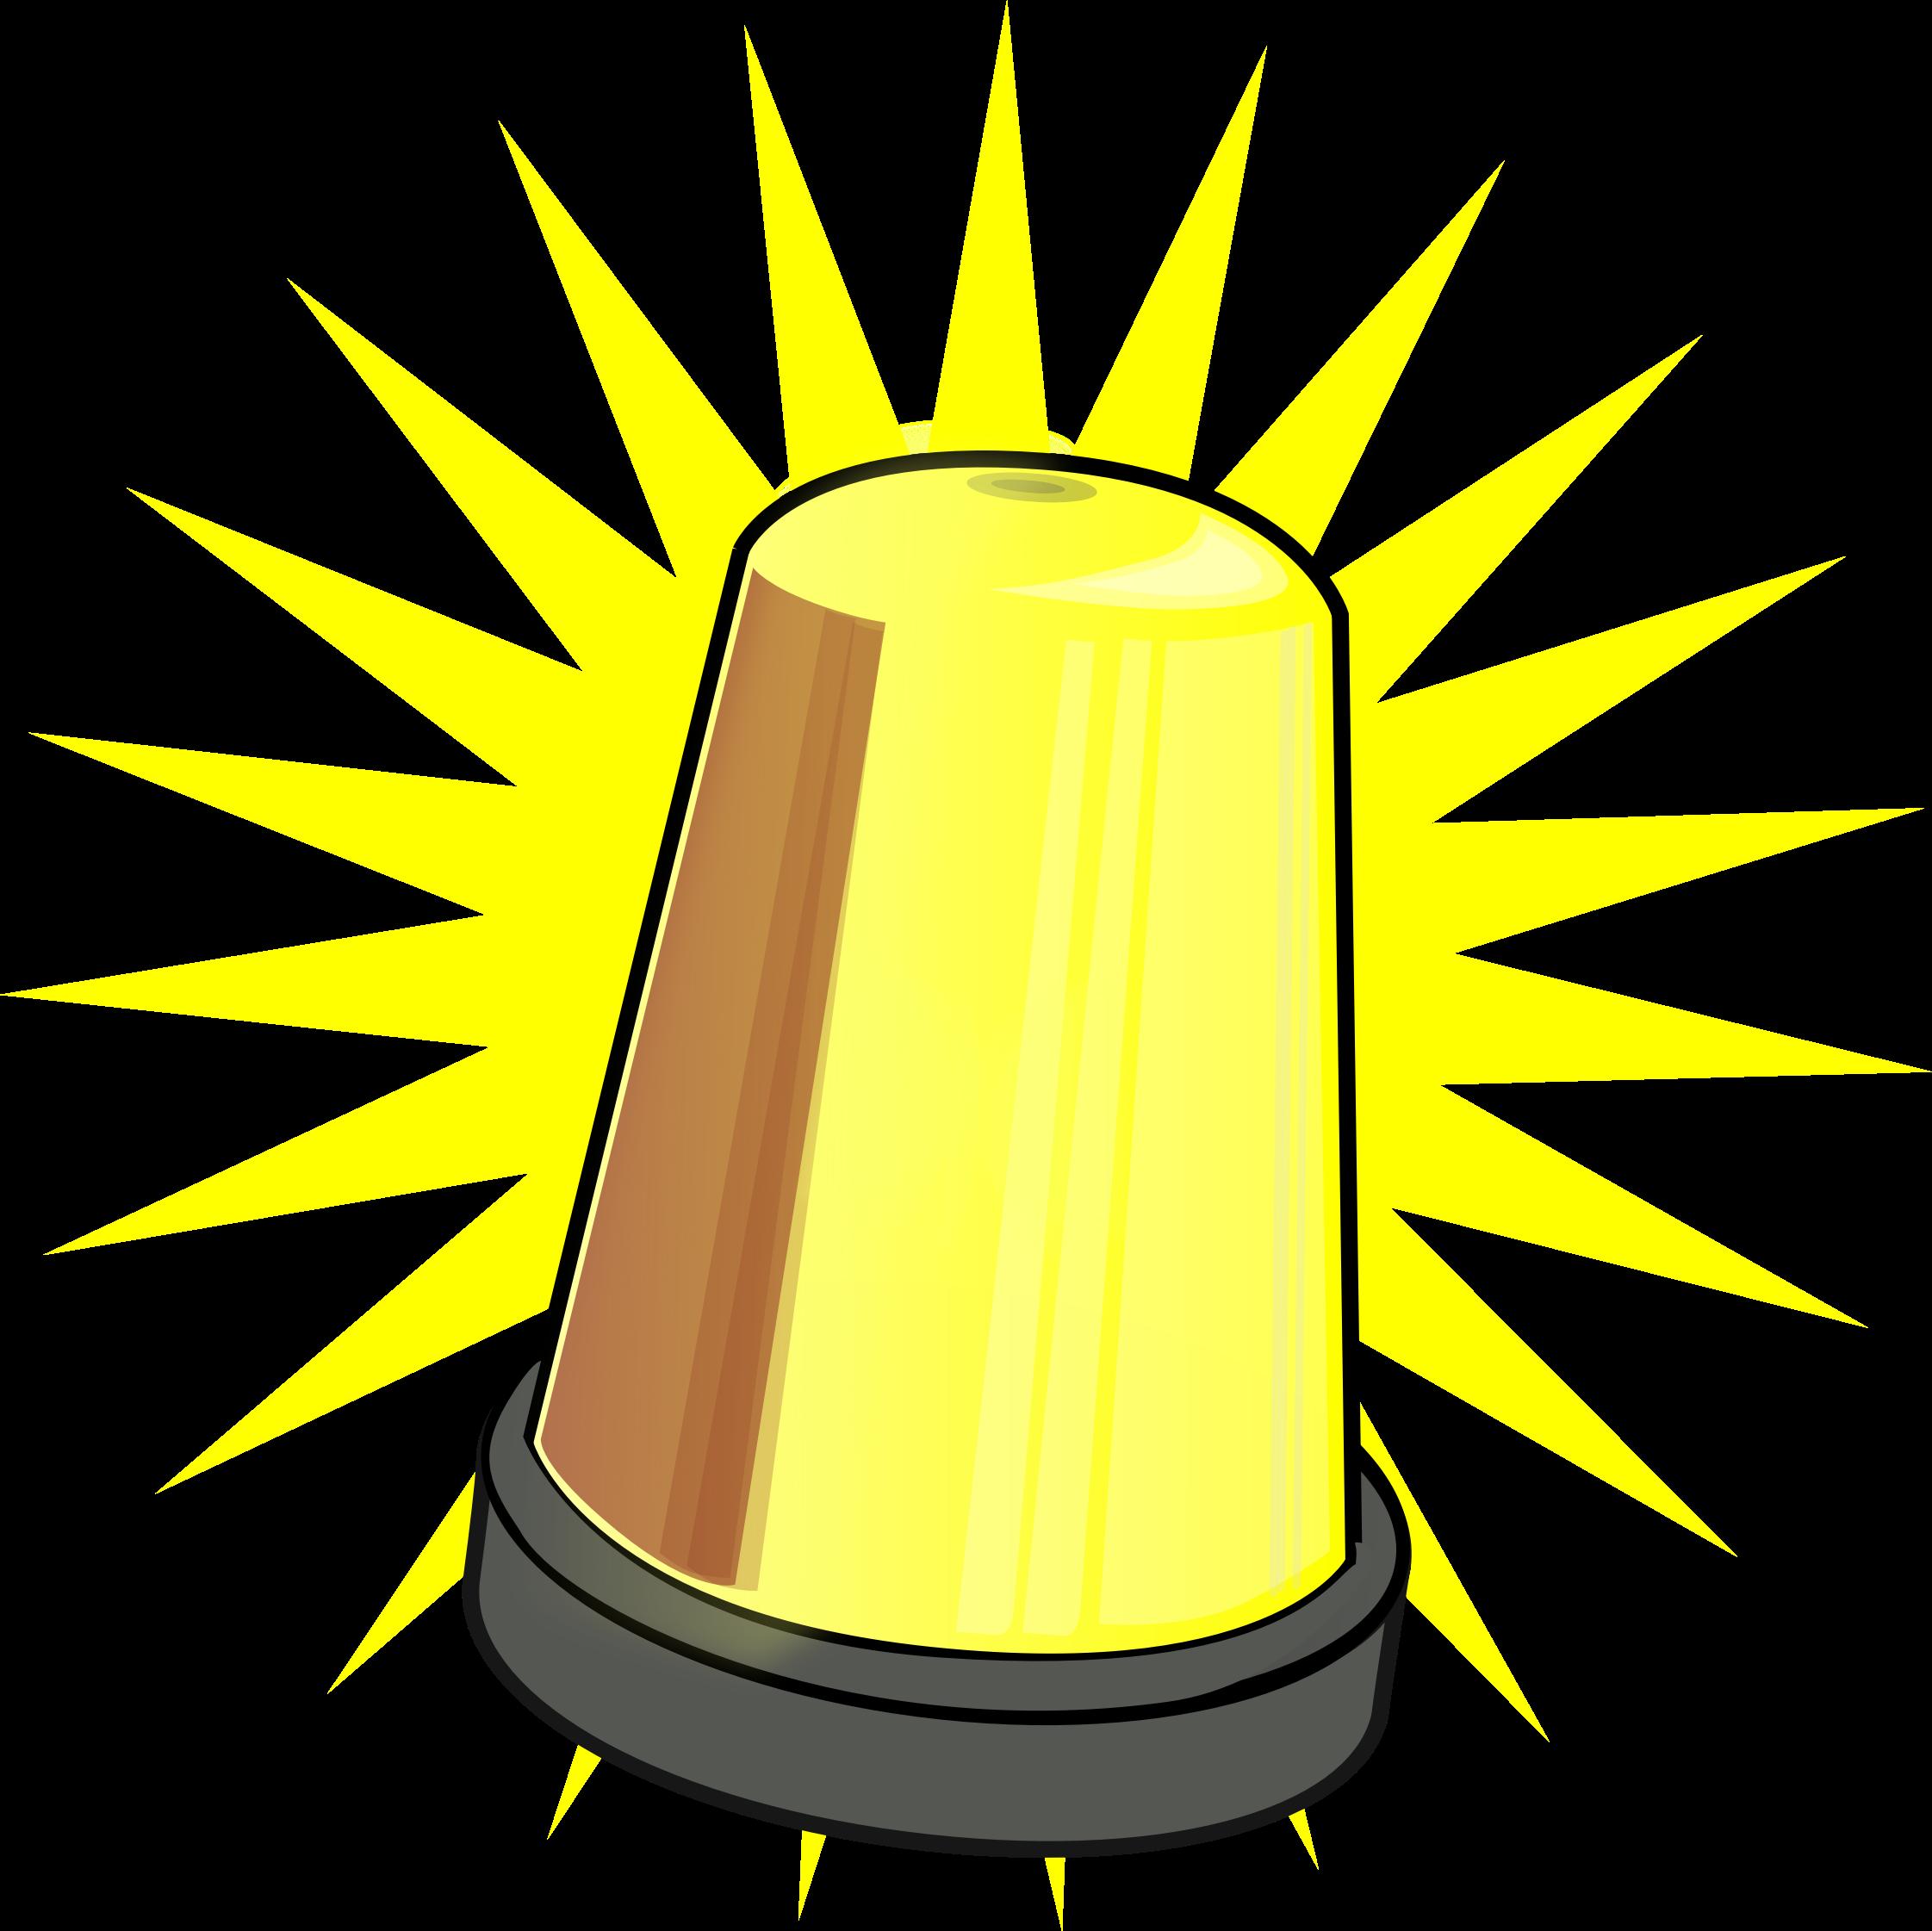 Lamp clipart flashlight.  great yellow traffic